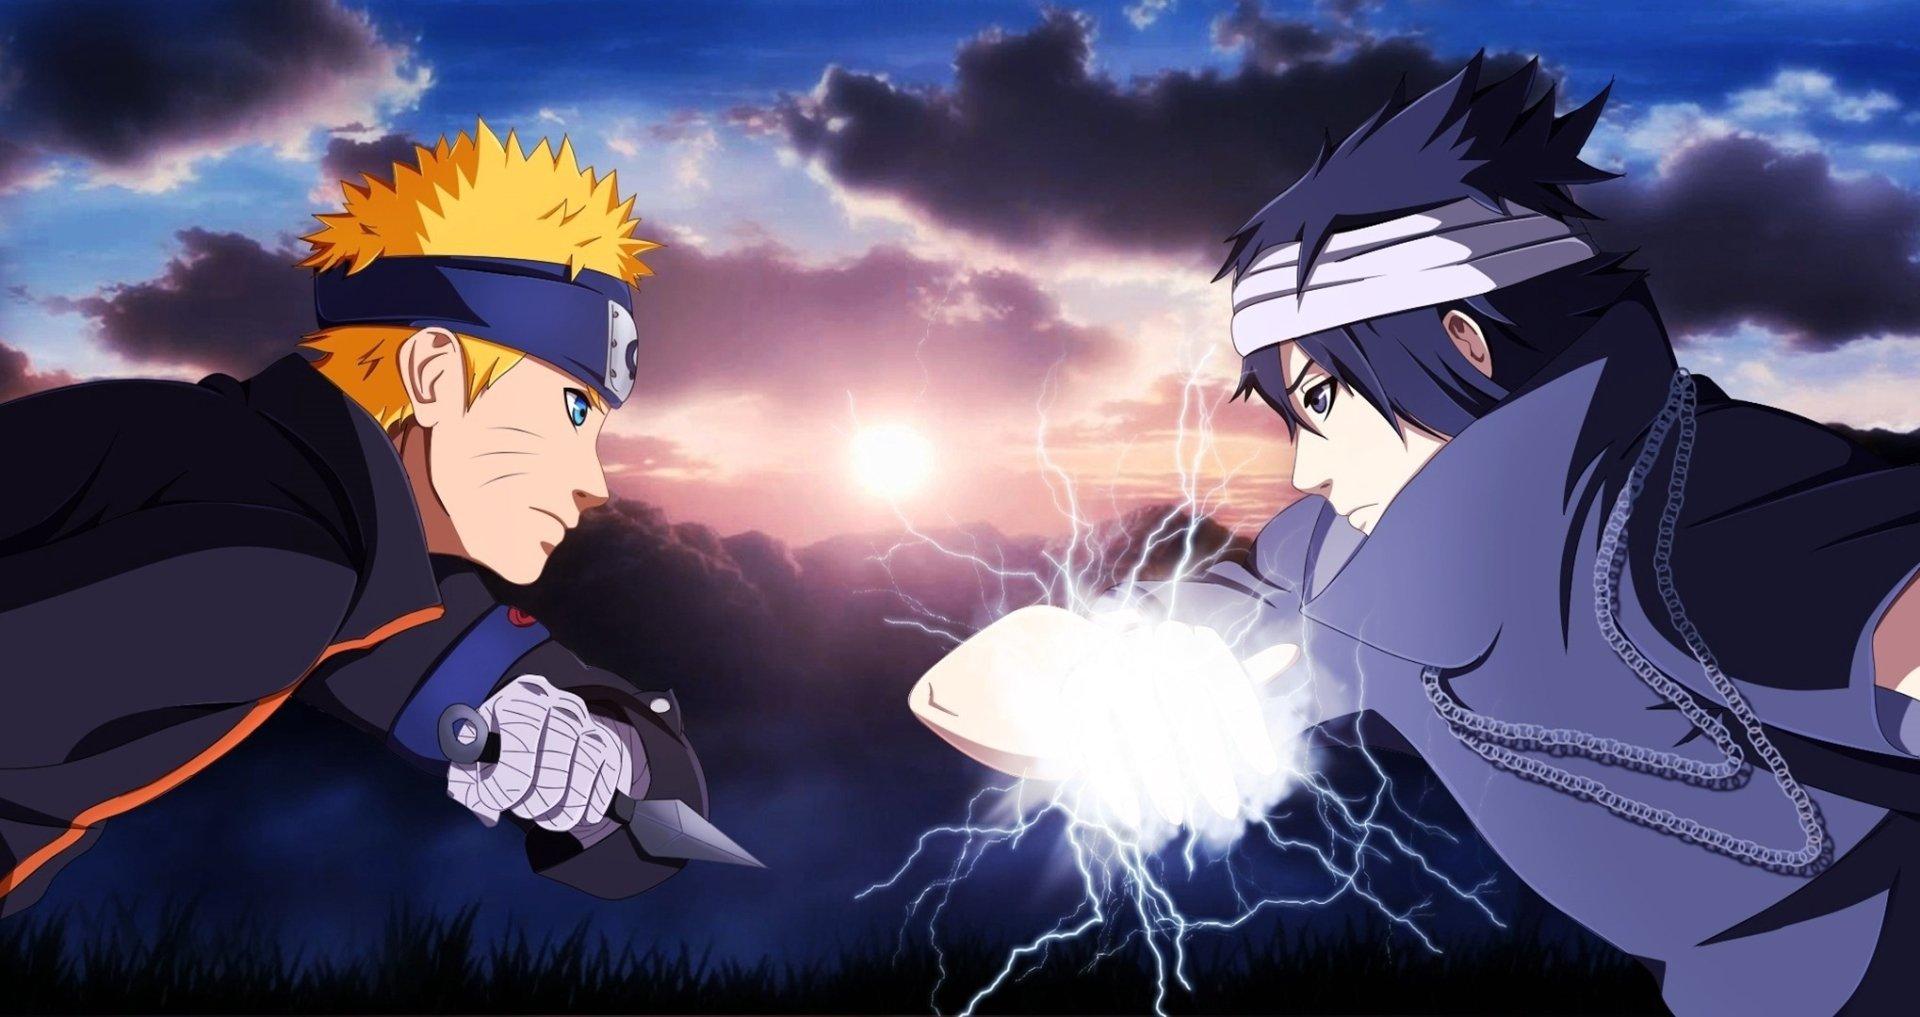 Naruto Vs Sasuke Fondo de pantalla HD   Fondo de Escritorio   2038x1080   ID:644142 - Wallpaper ...